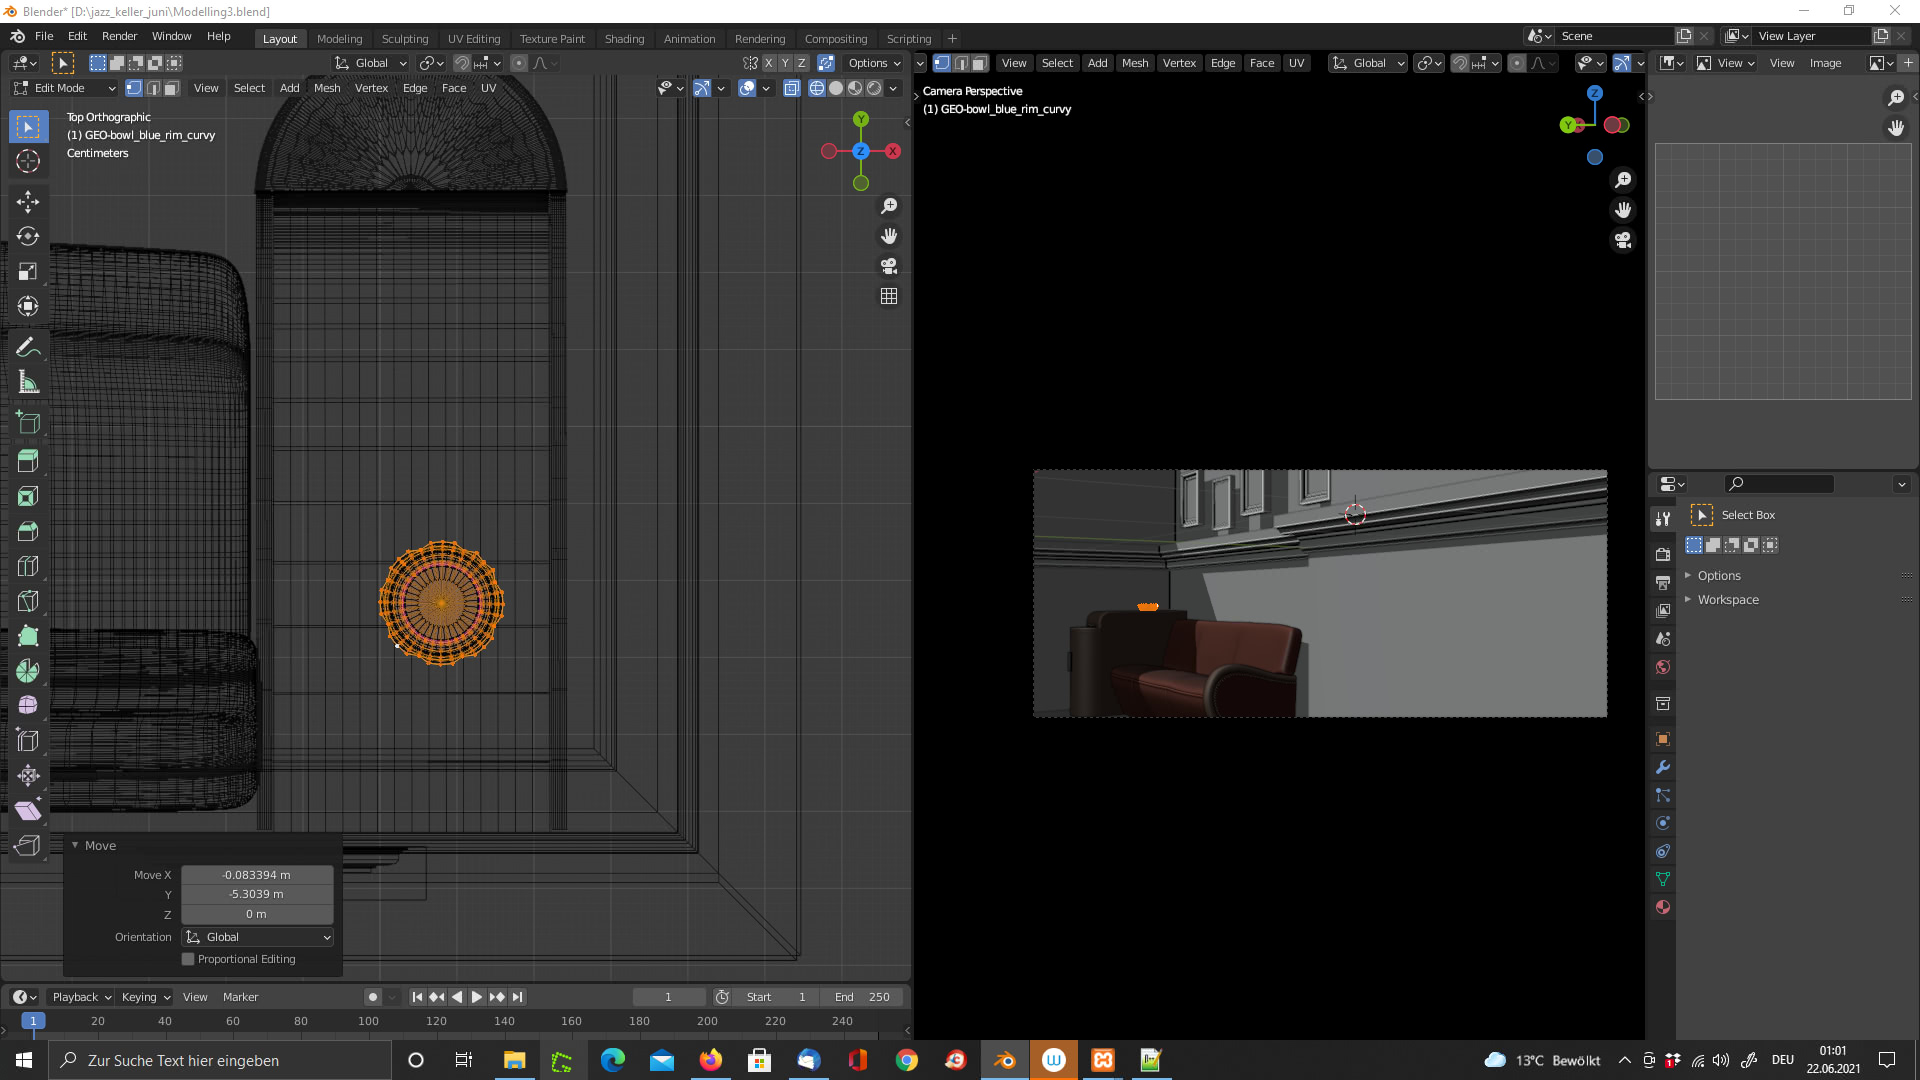 Jezzkeller in 3D